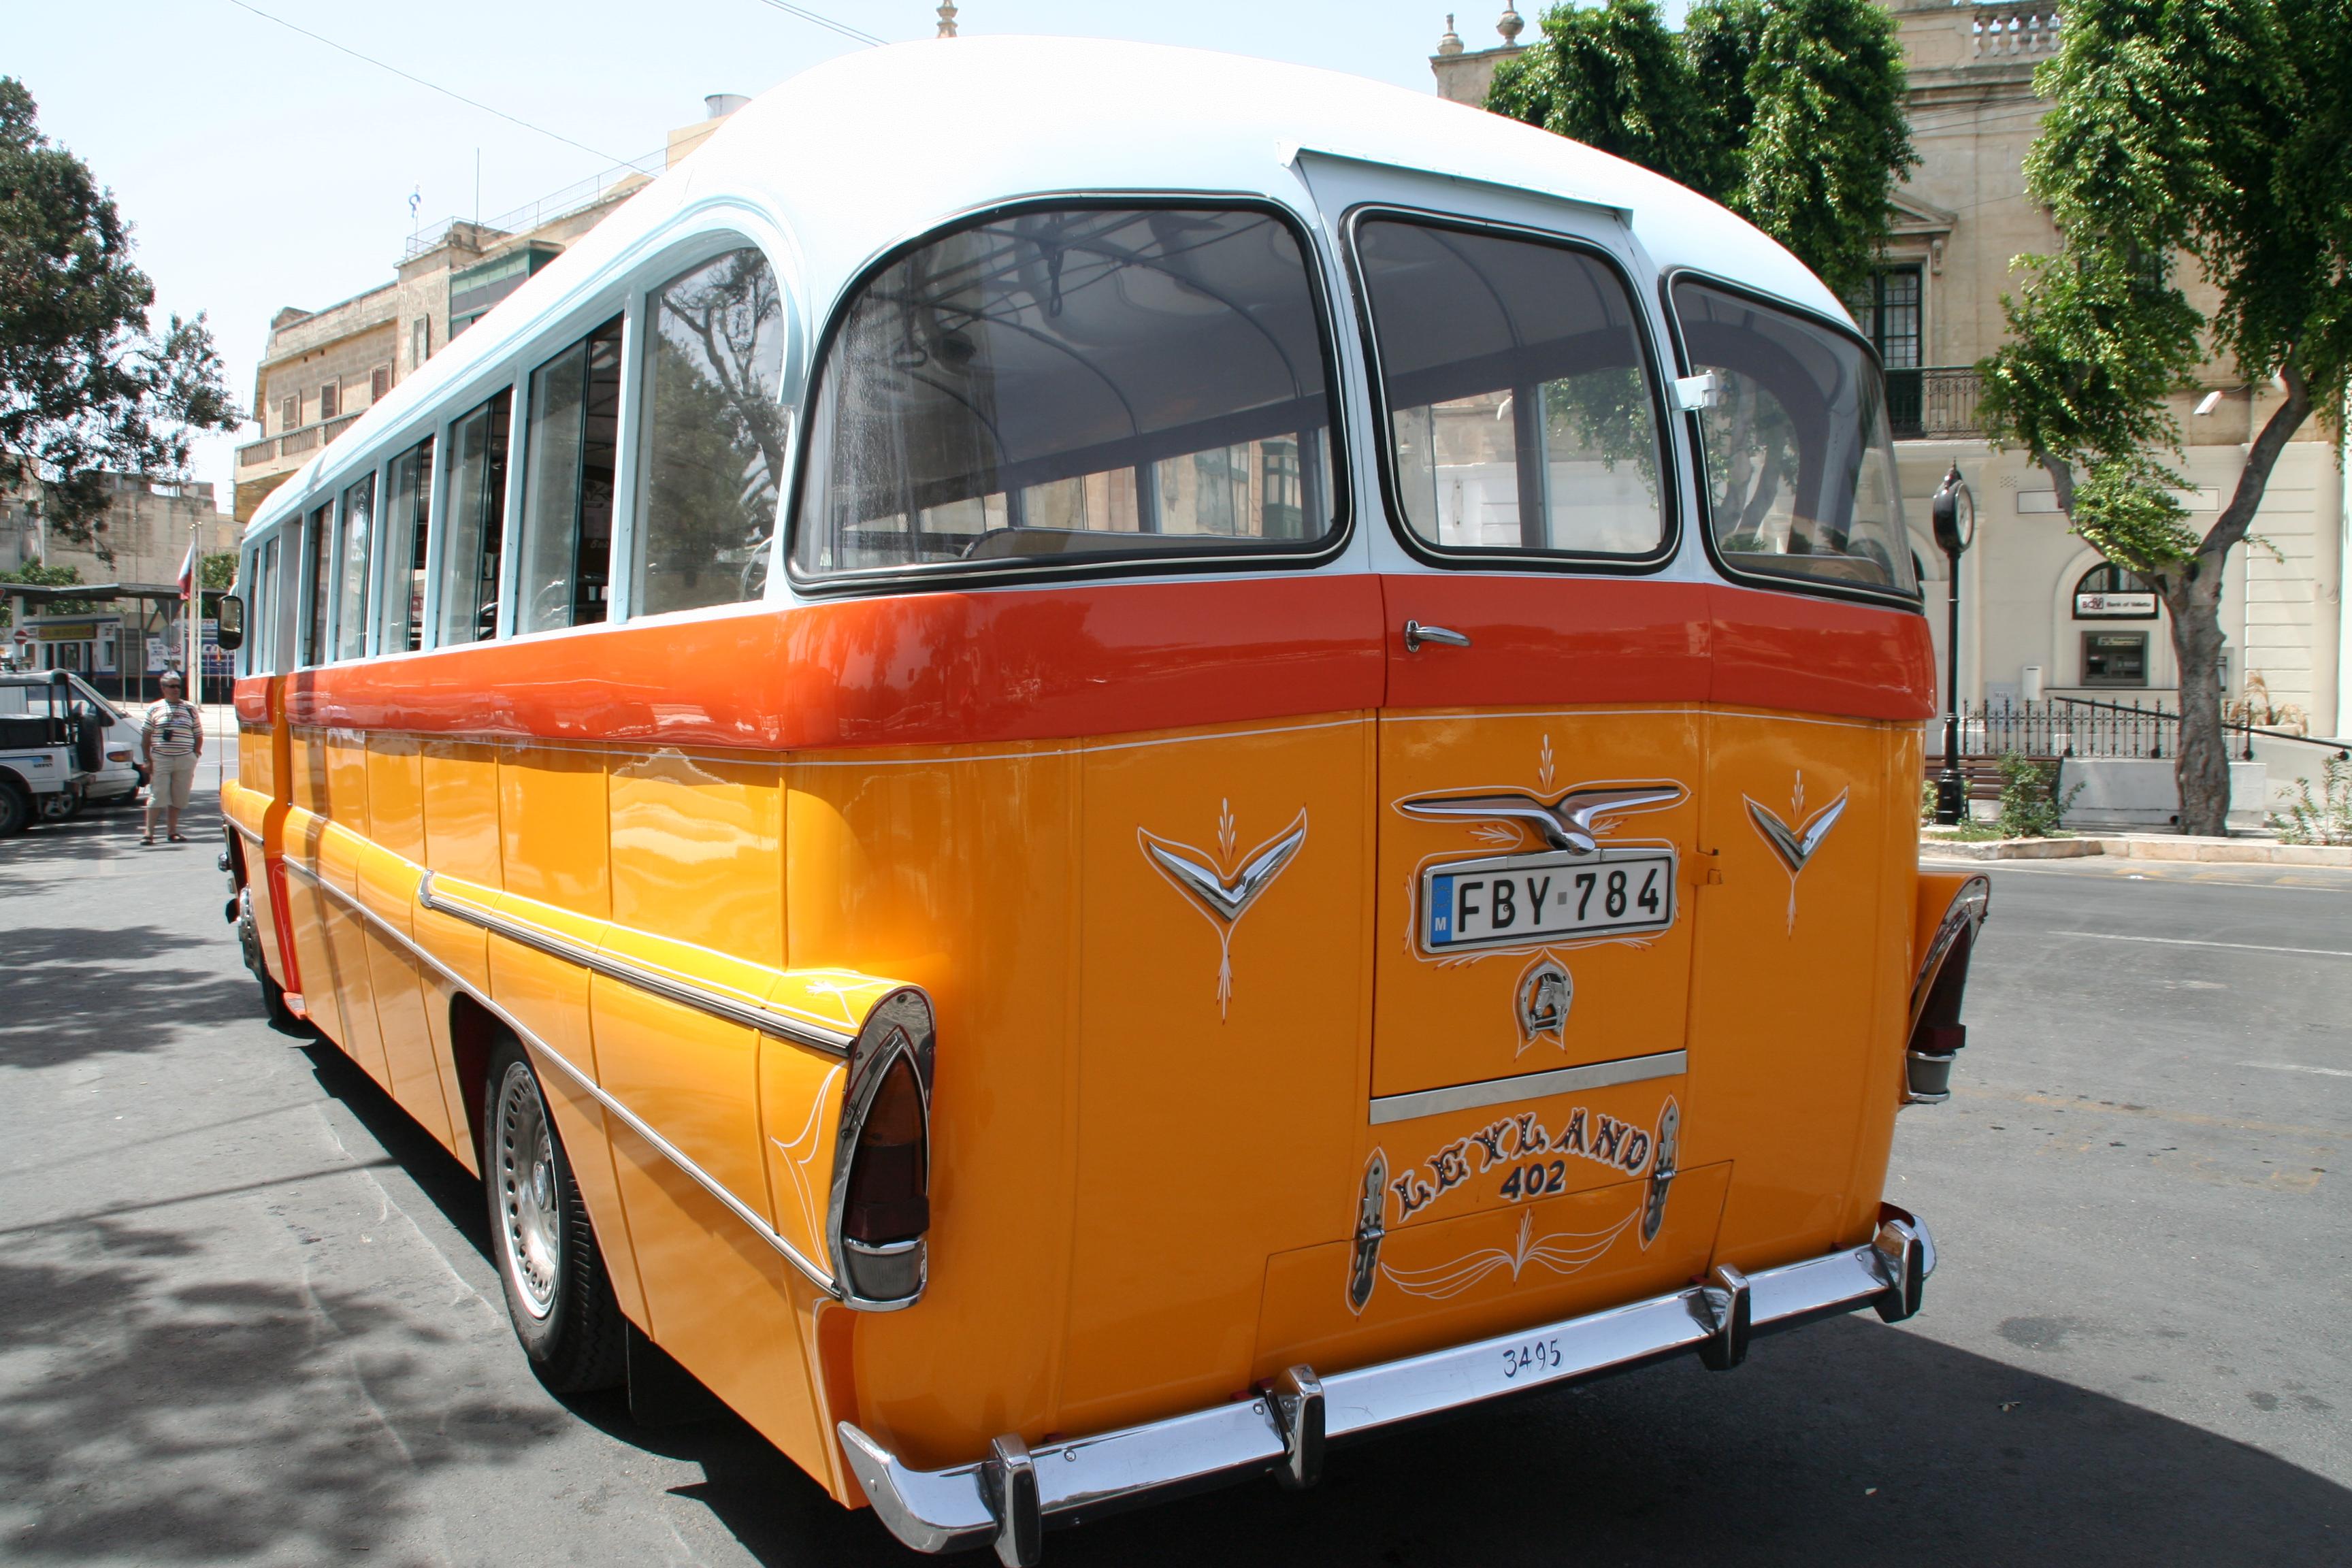 File:Malta Bus FBY 784.jpg